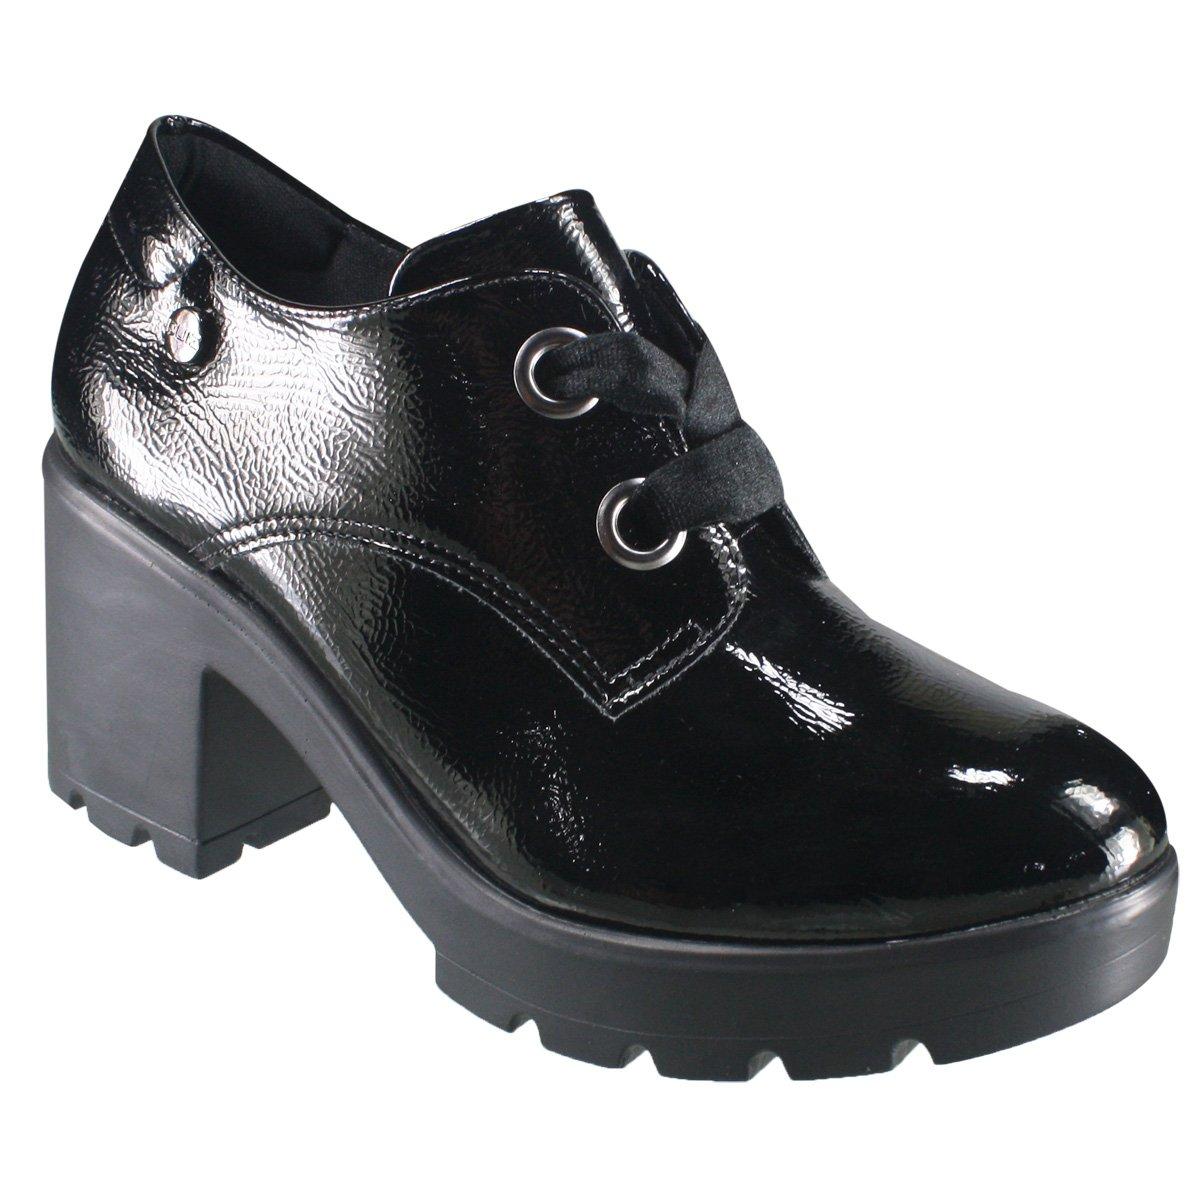 747ce8902 Sapato Feminino Oxford Quiz 69-69230 - Preto (Verniz Show) - Botas ...